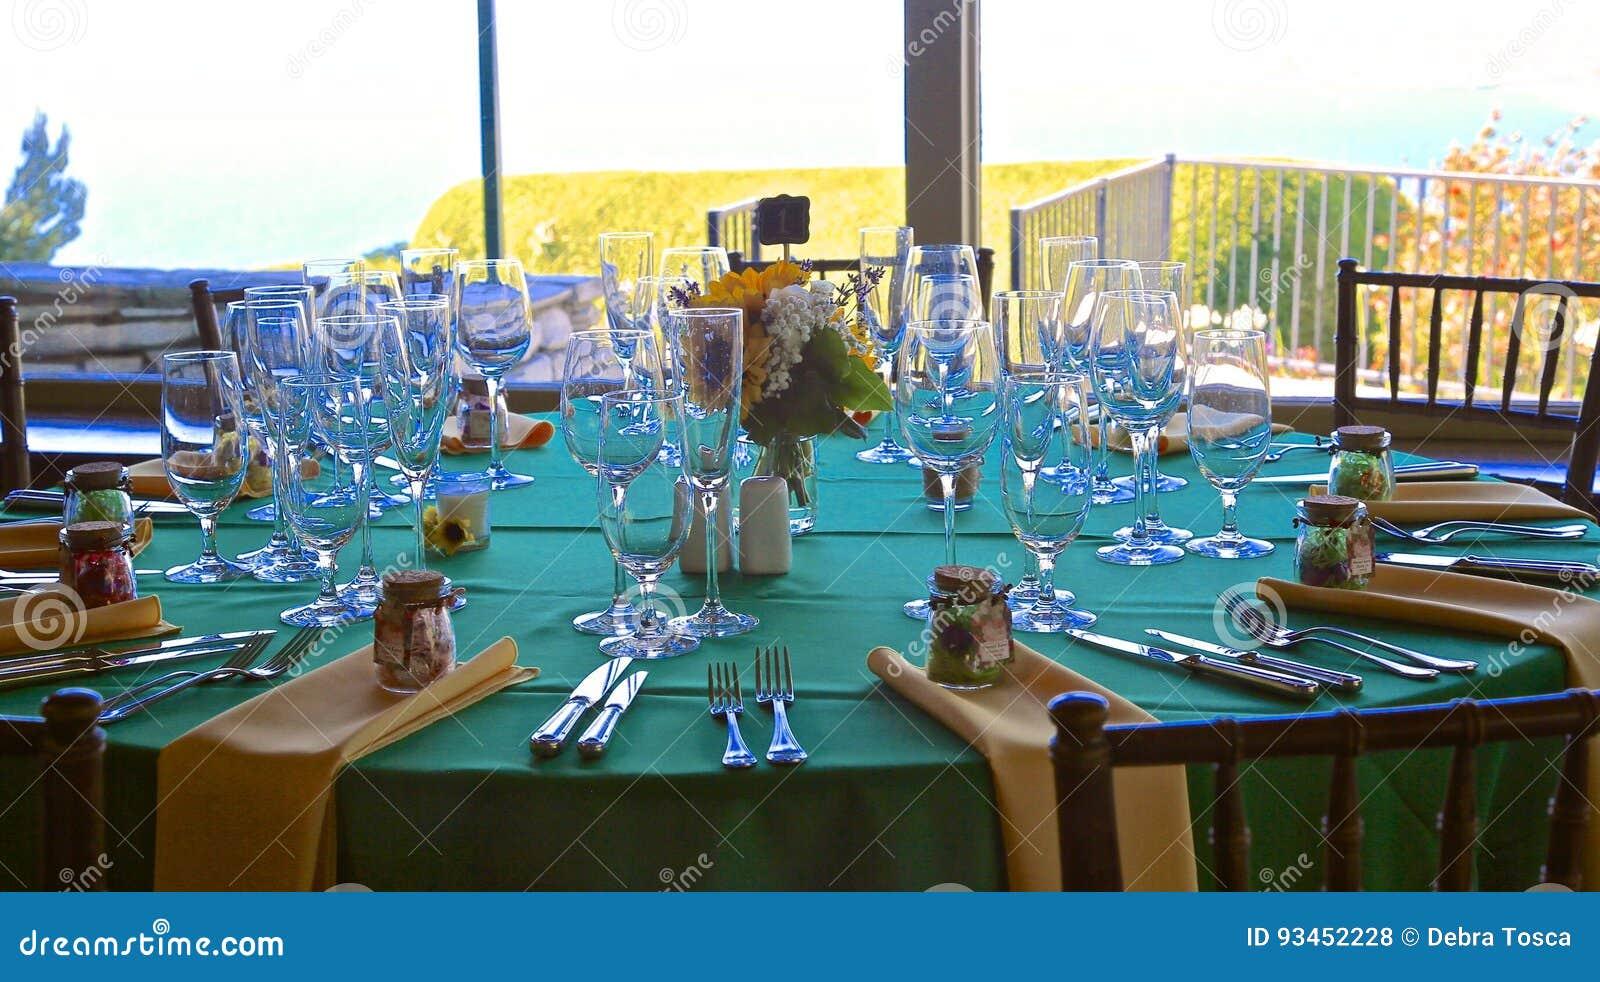 Wedding Venue Table Settings Stock Photo Image Of Beautiful